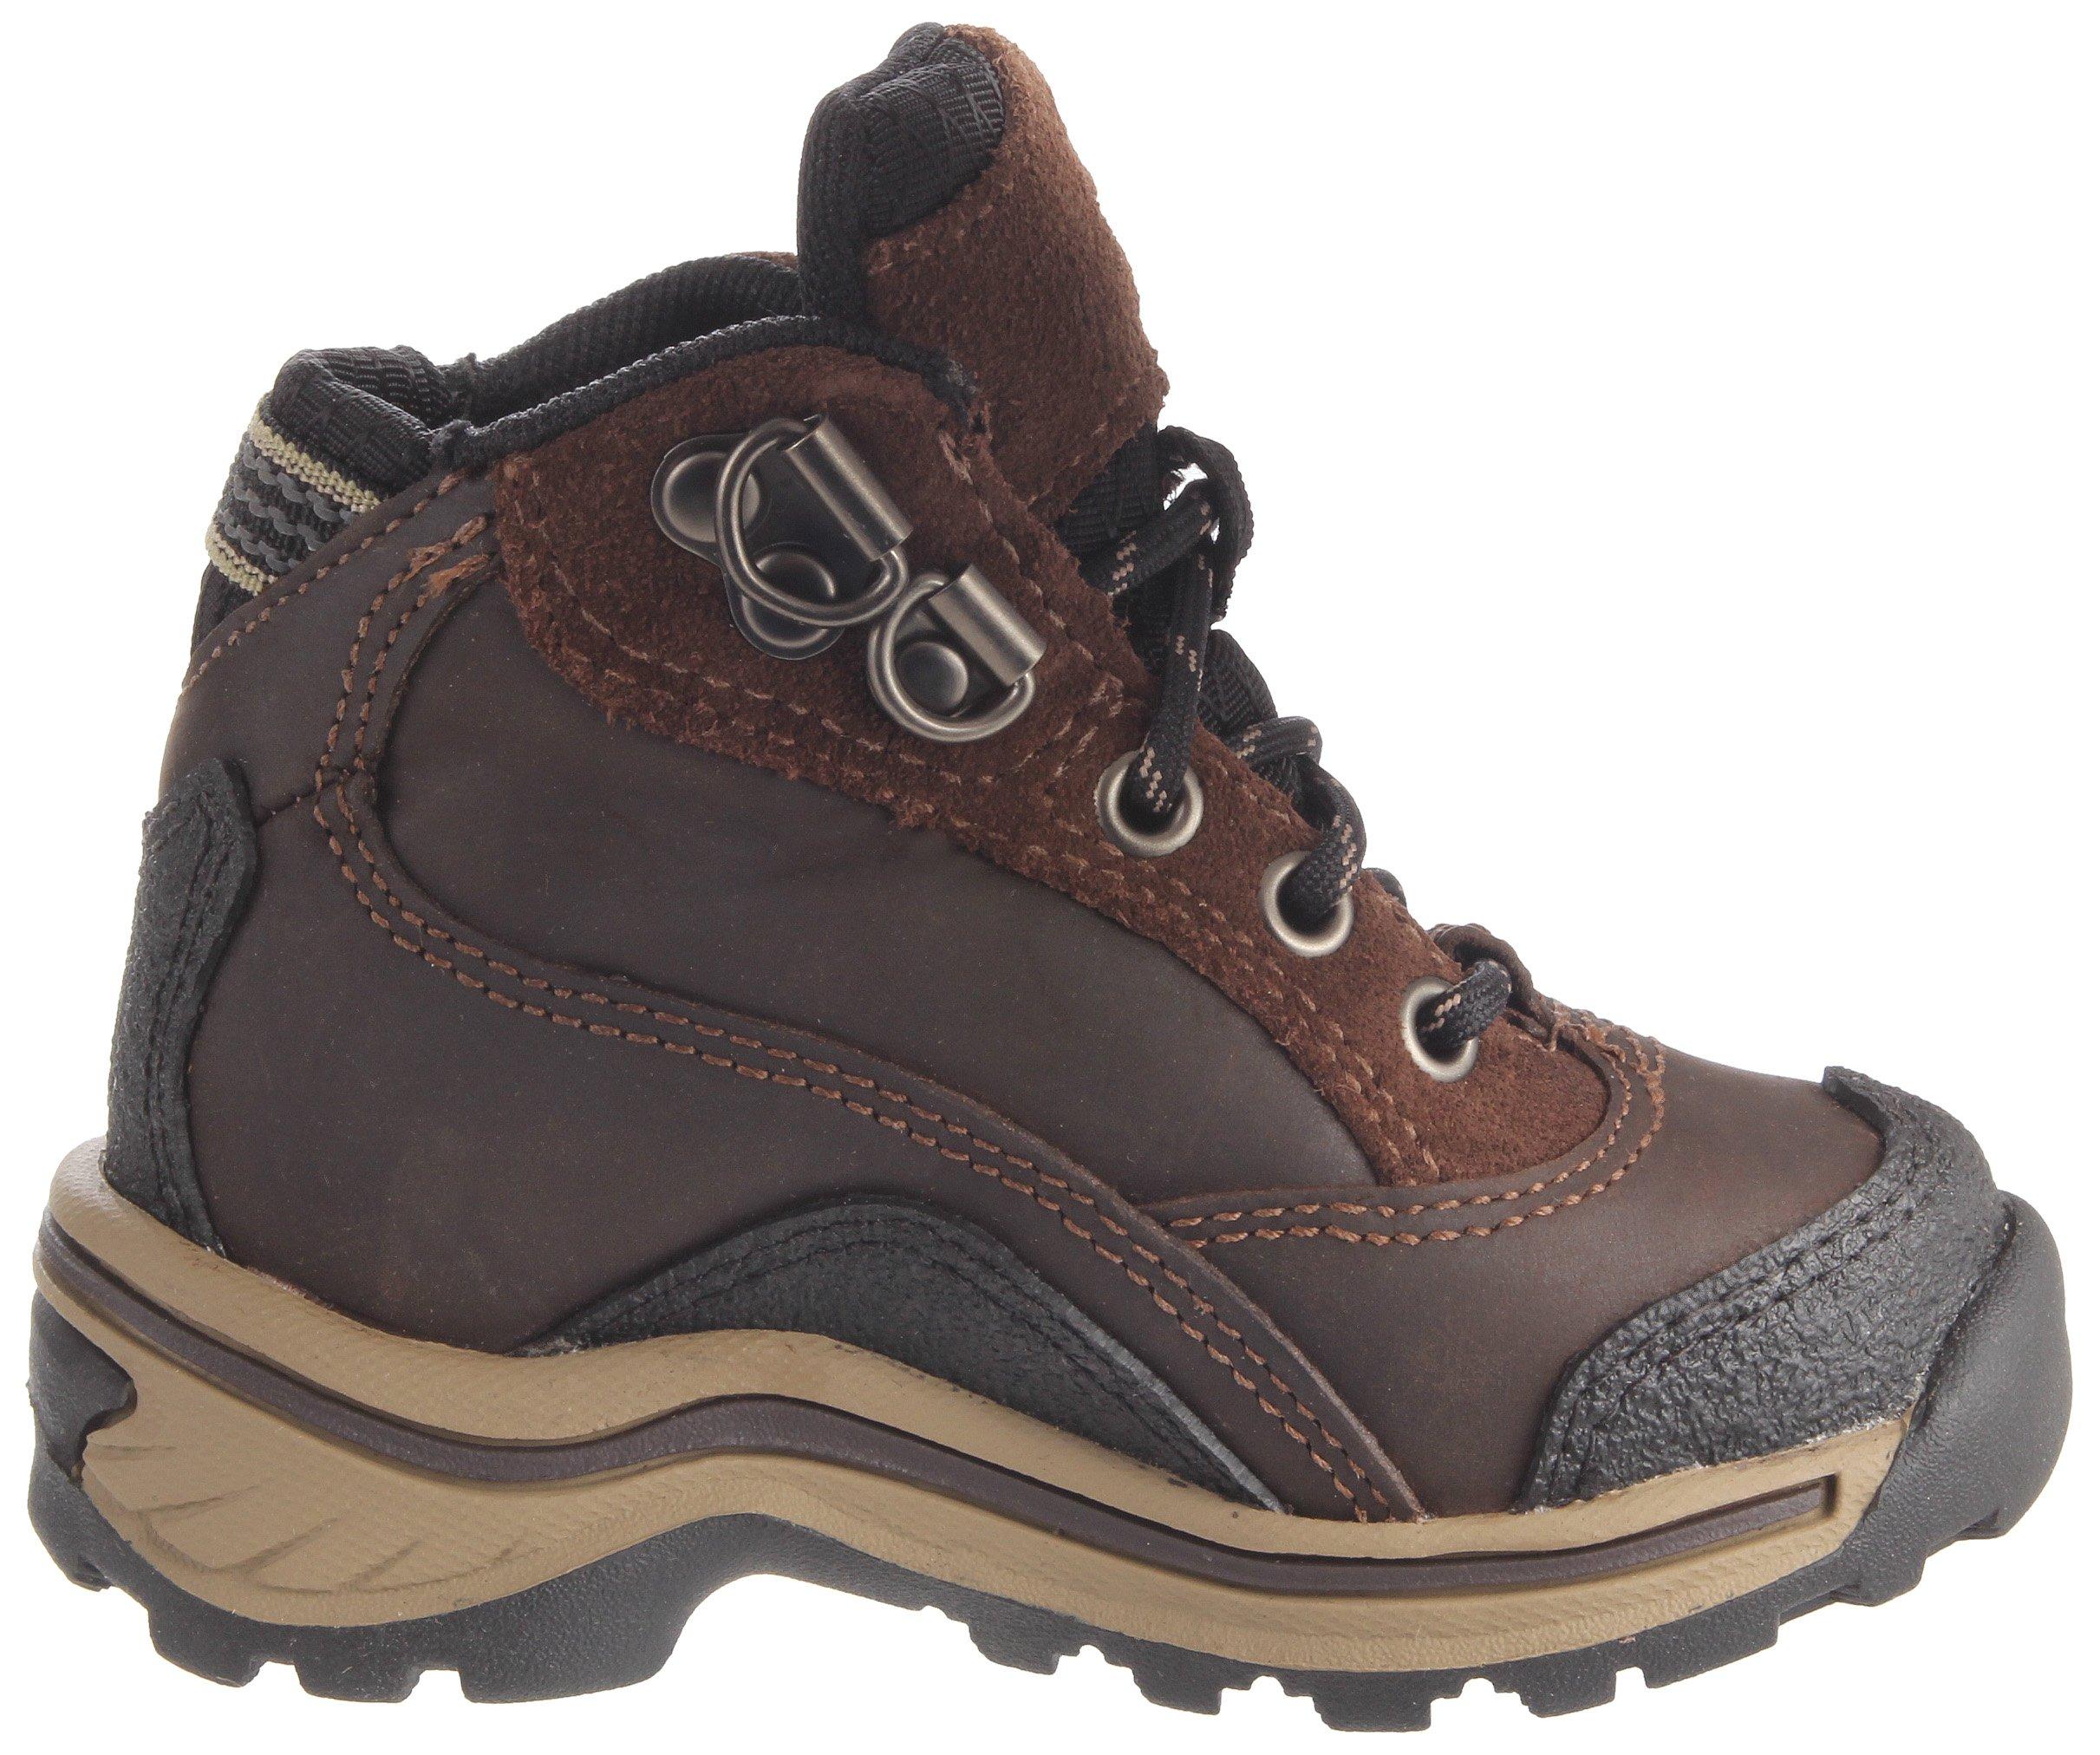 Timberland Pawtuckaway, Unisex-Child Hiking Shoes 6